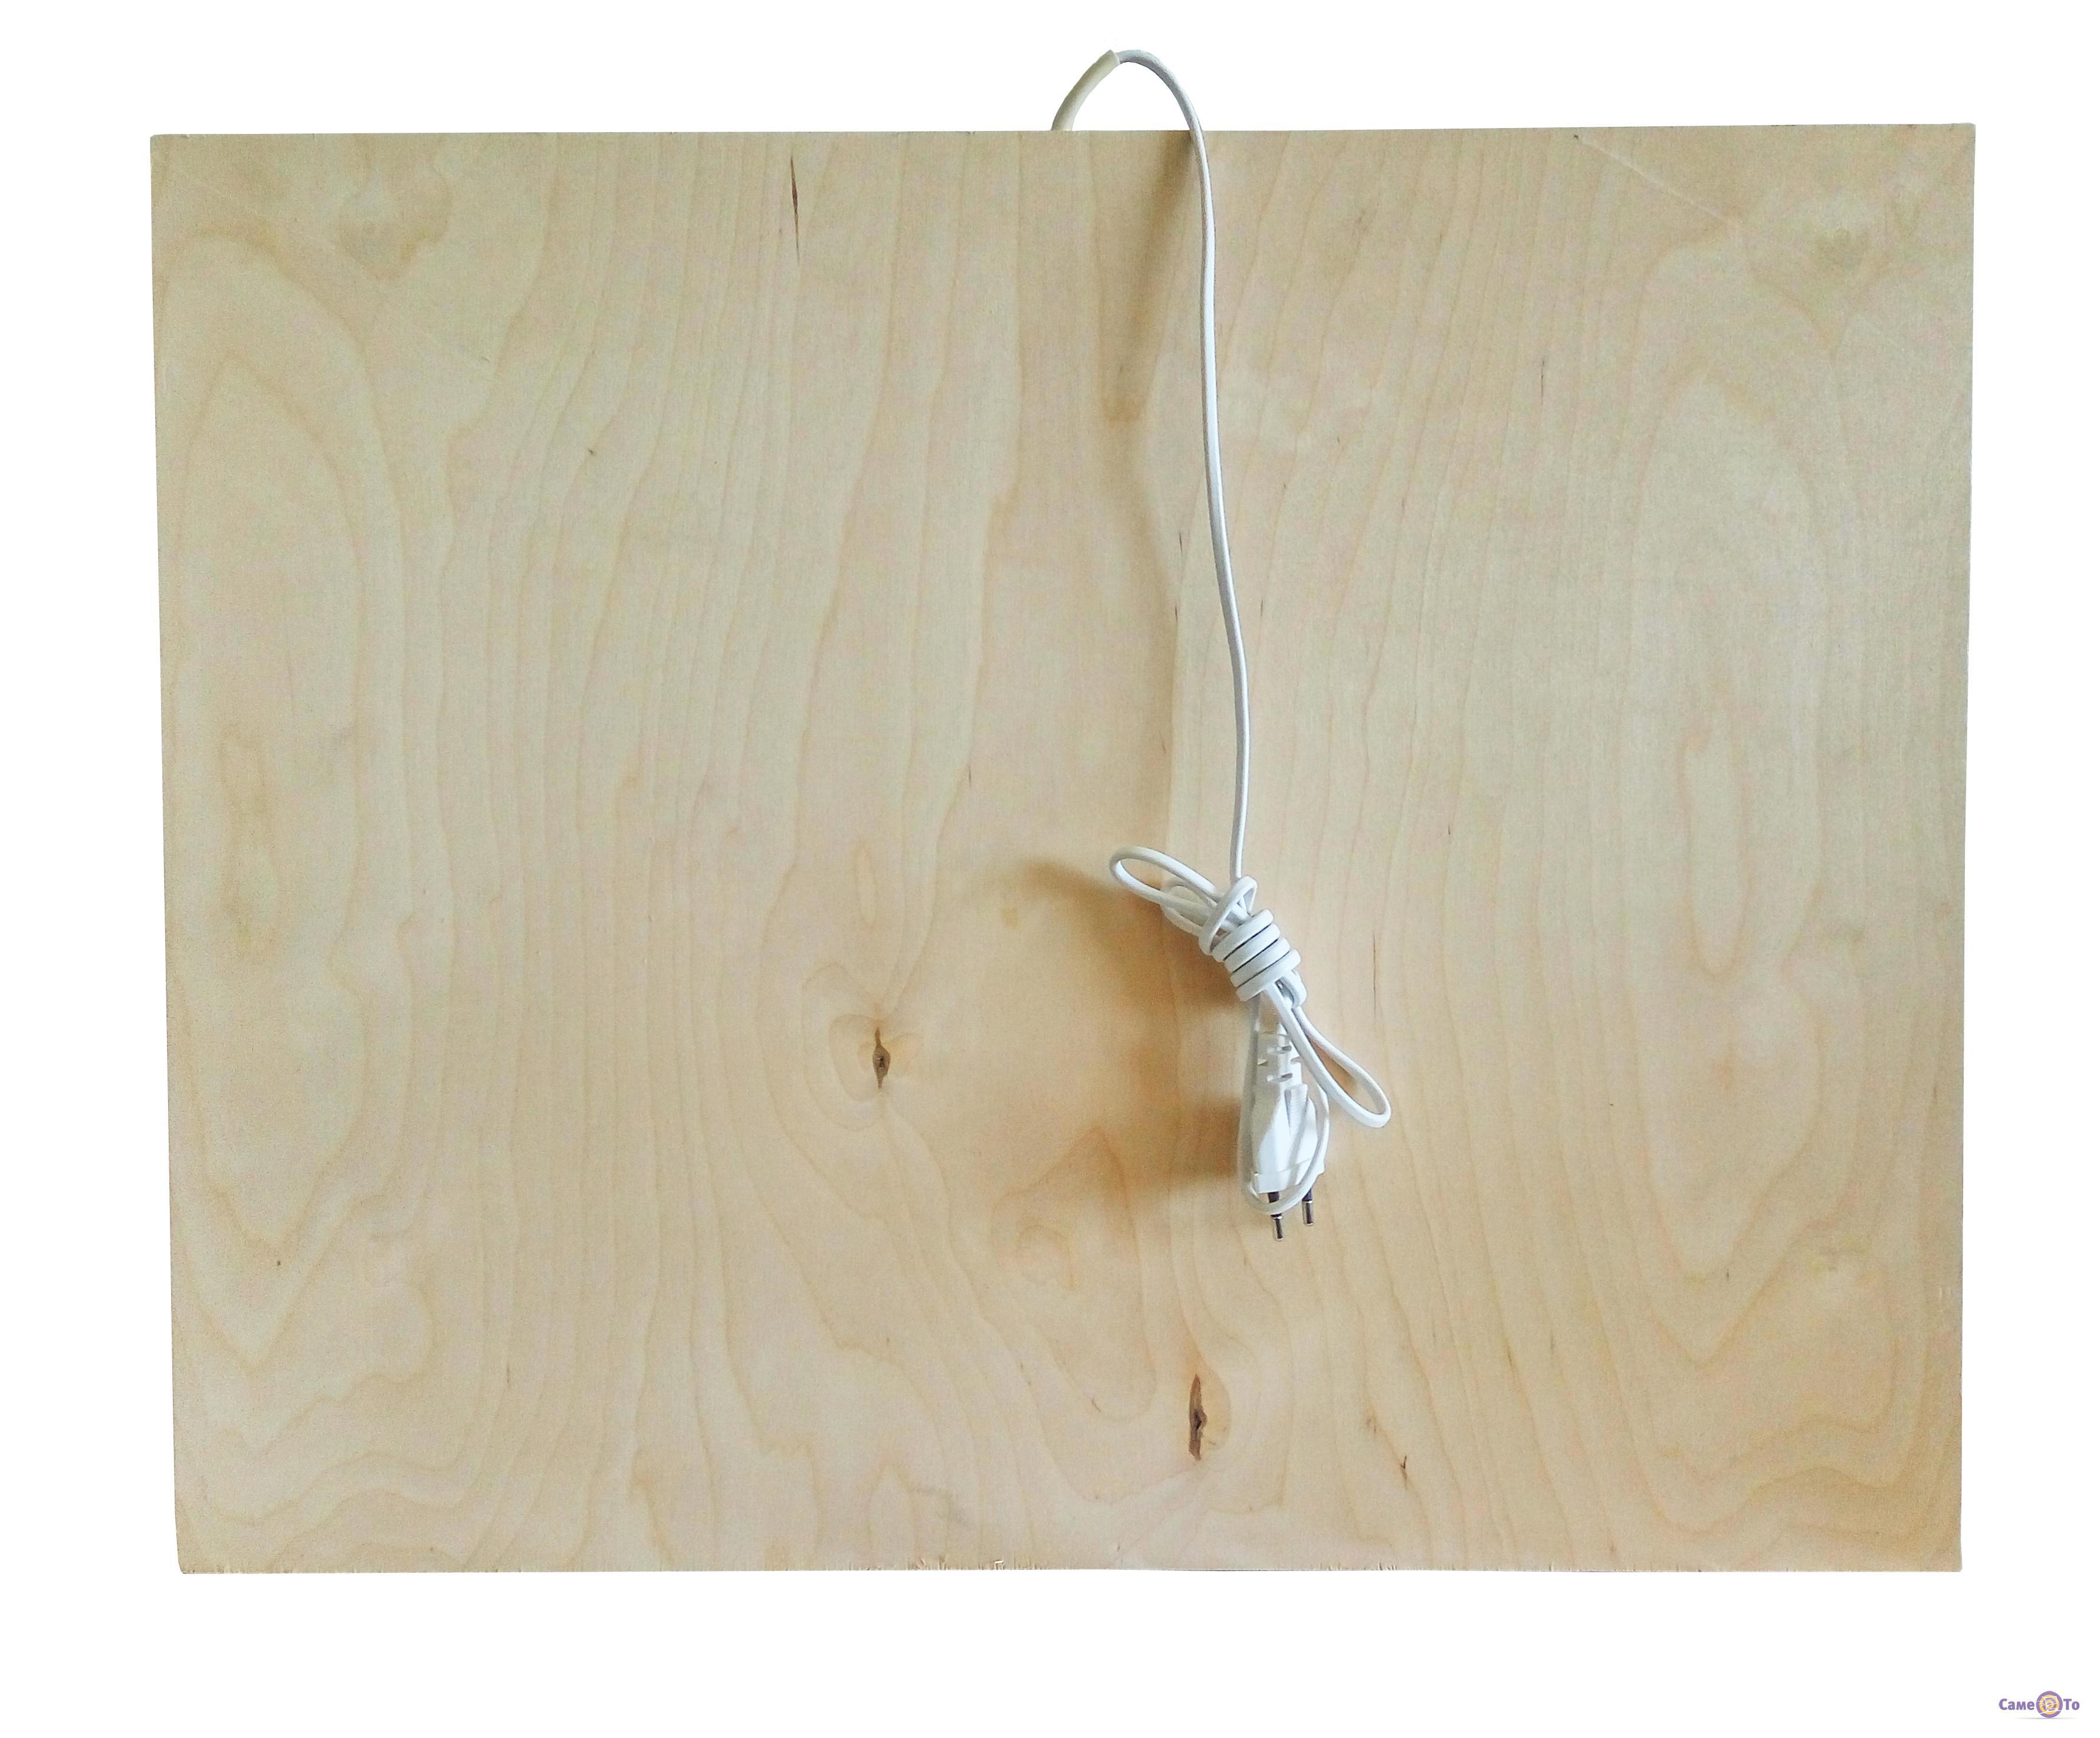 Обогреватель - подставка из дерева QSB 100W